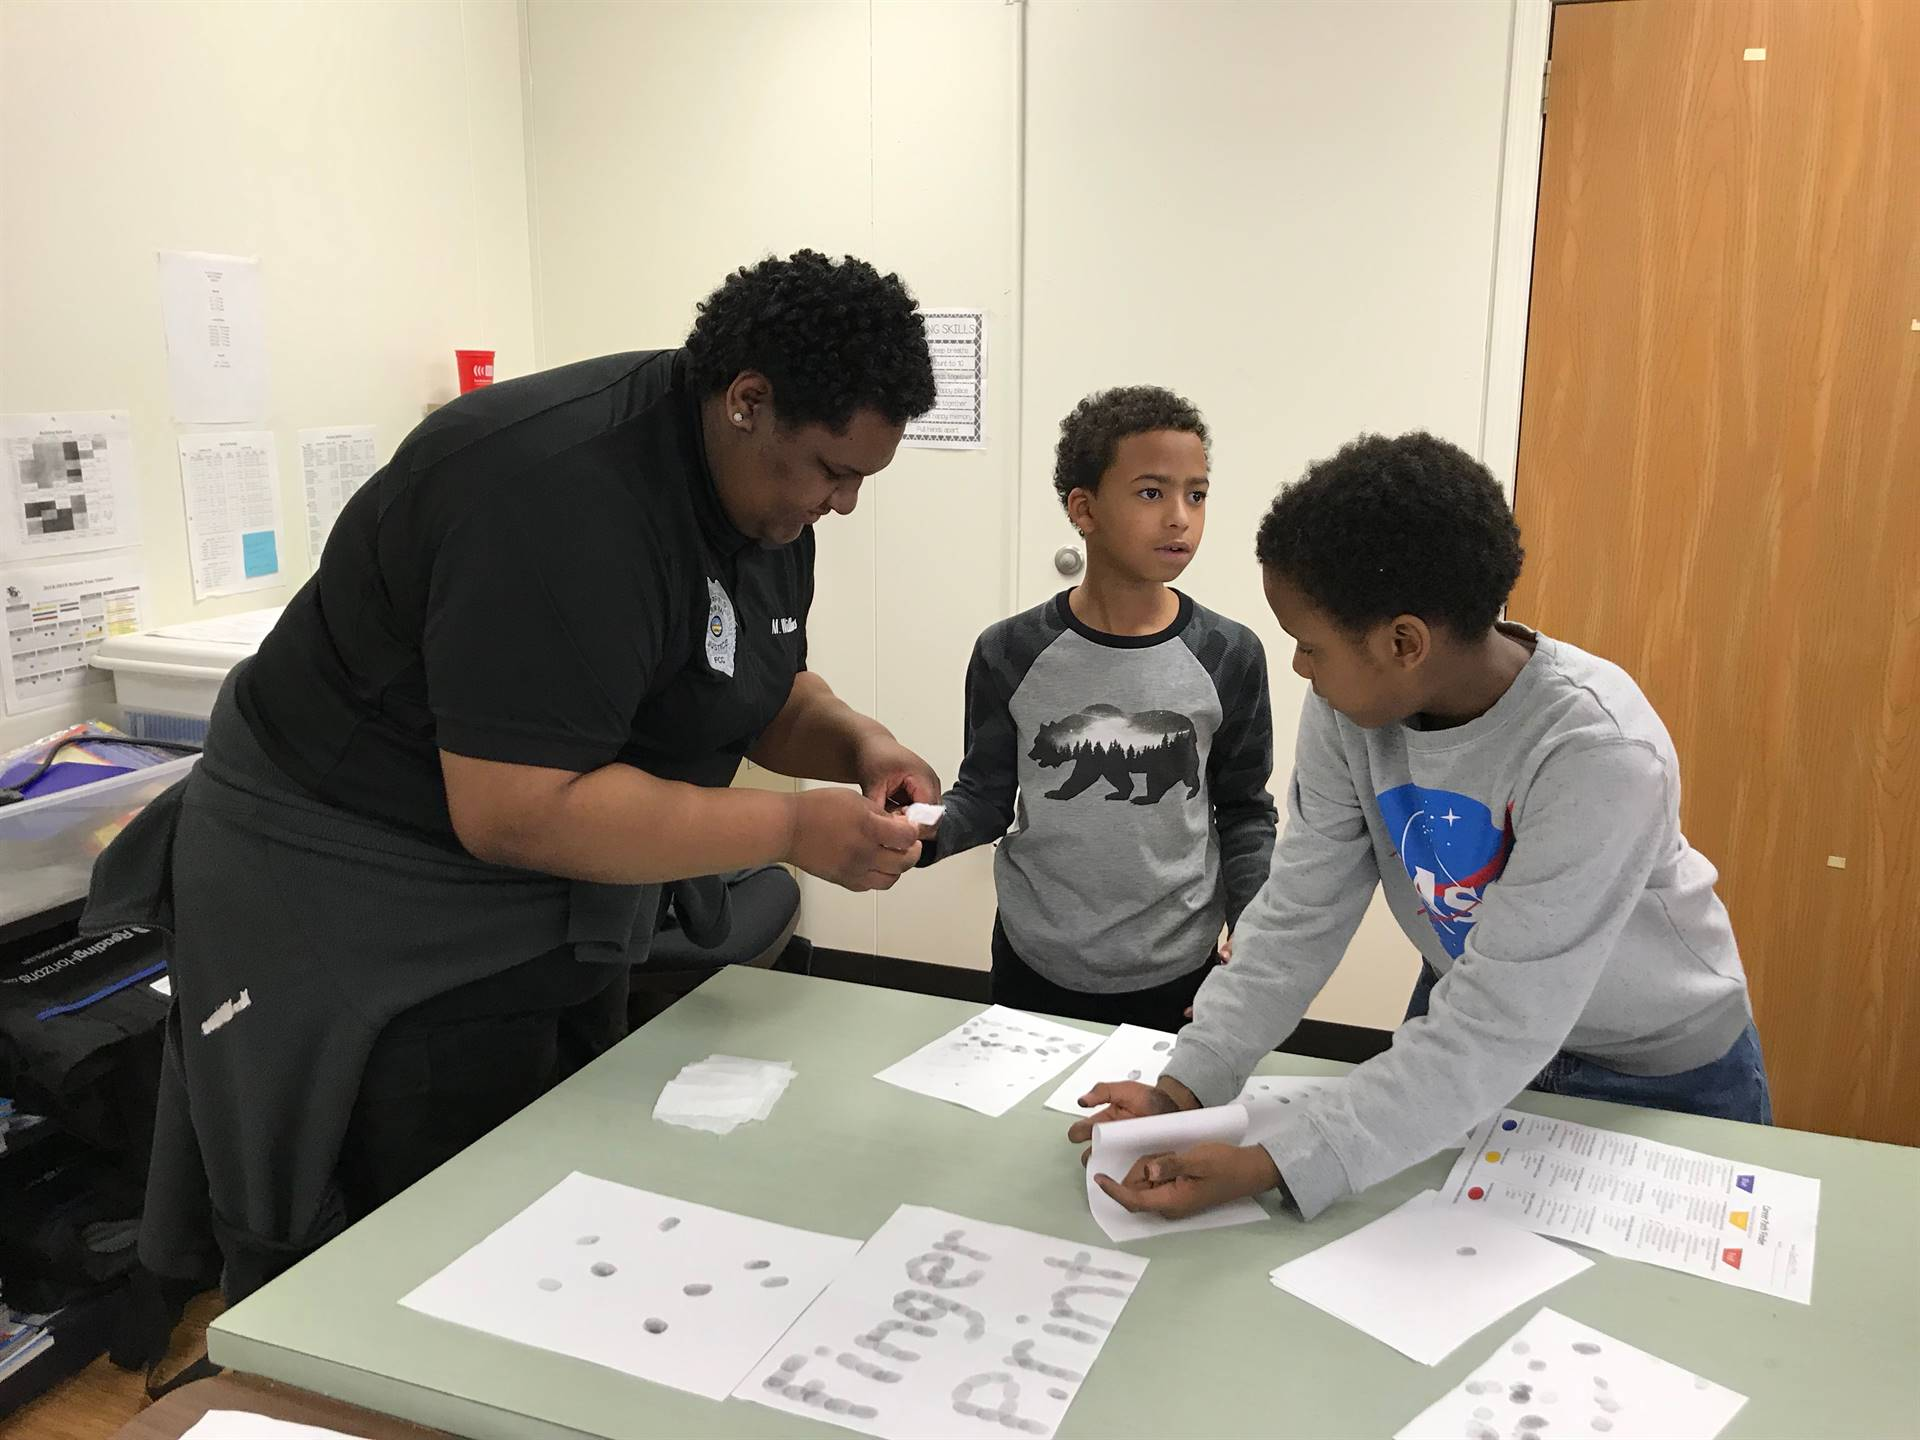 students being fingerprinted